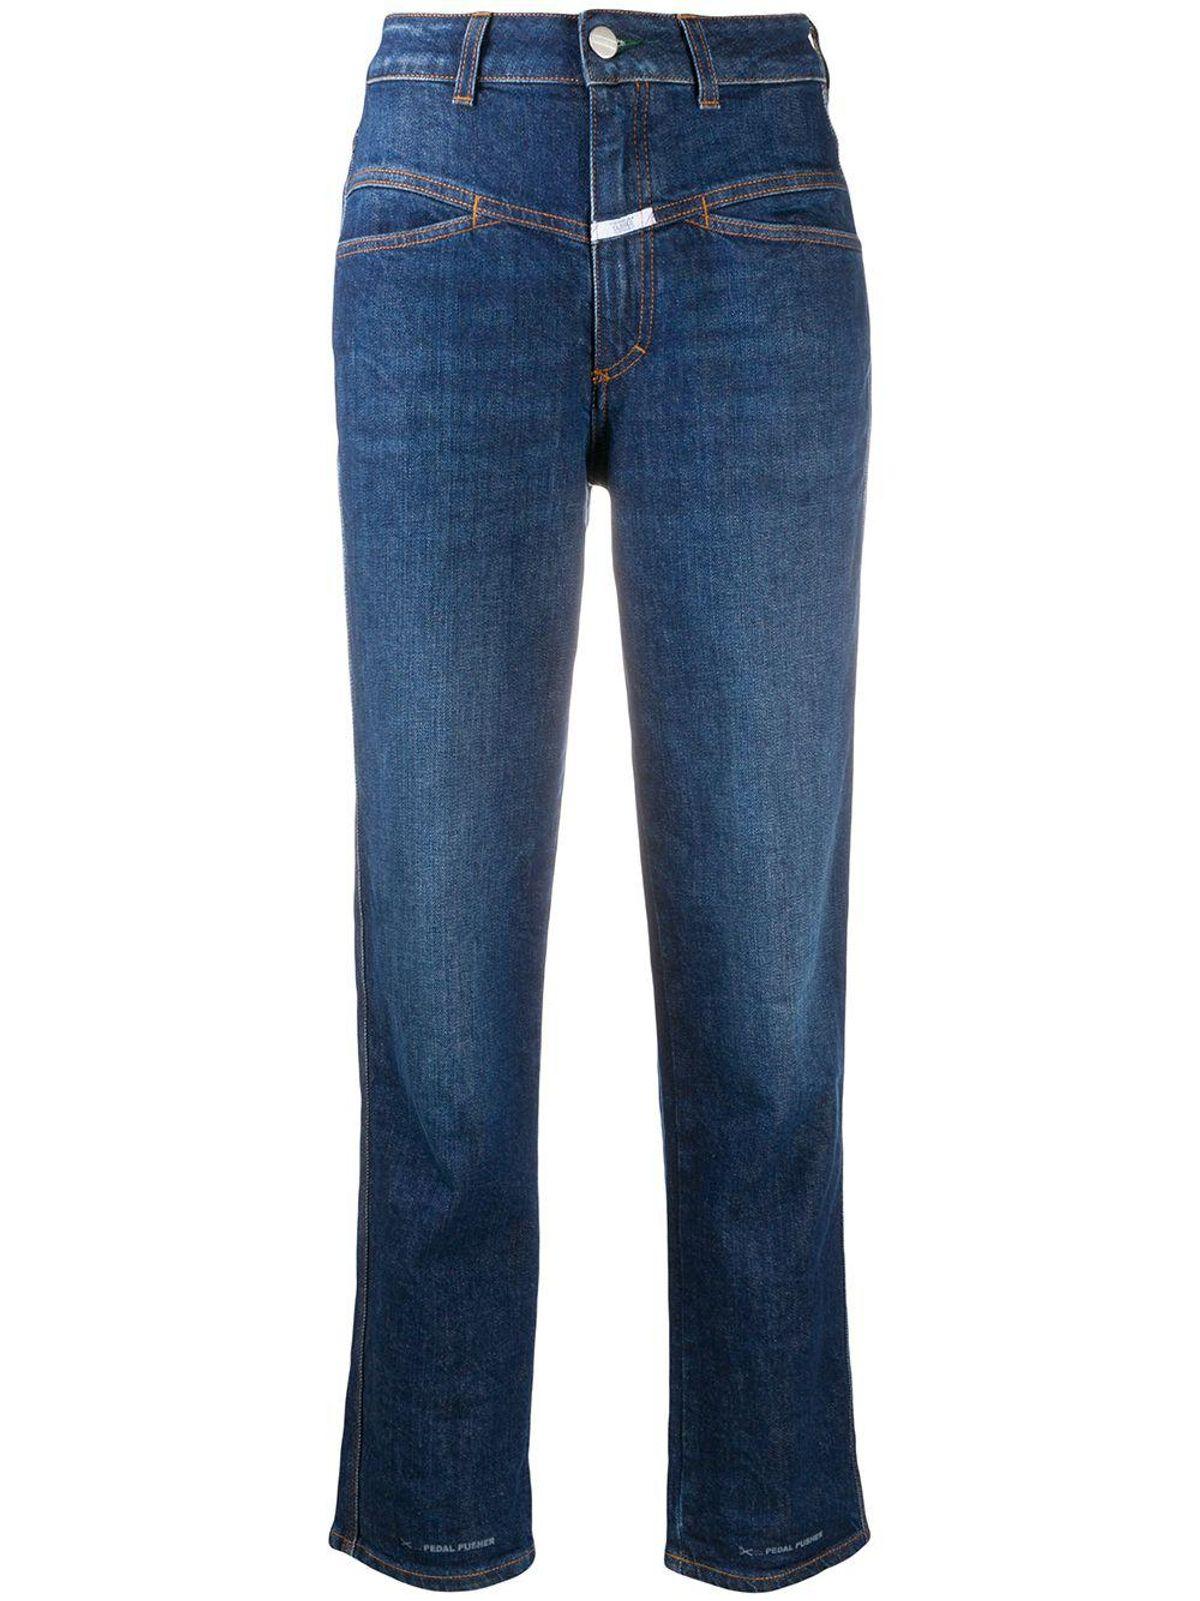 Pedal Pusher Straight Leg Jeans